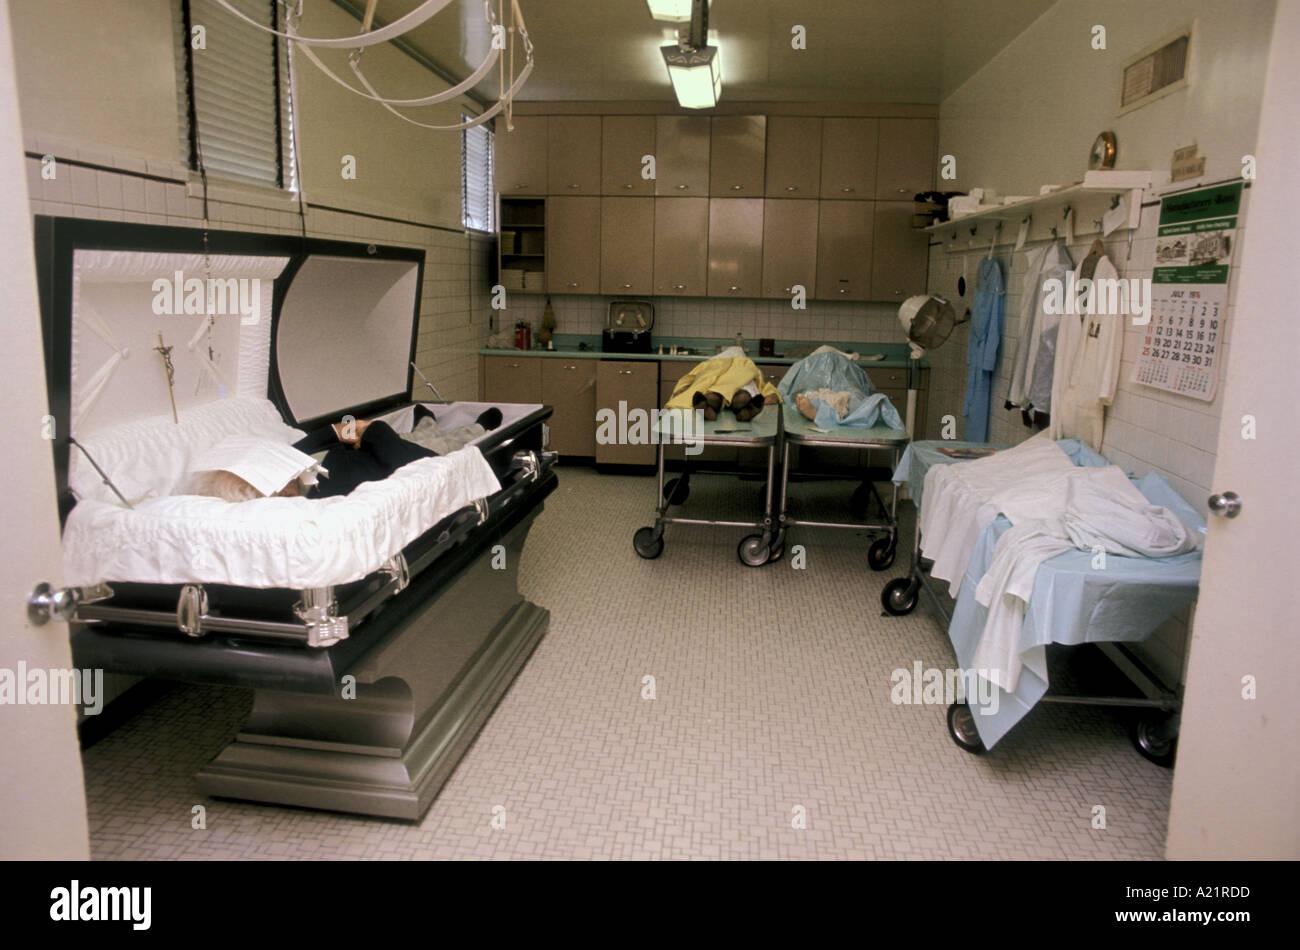 Mortuary in America - Stock Image